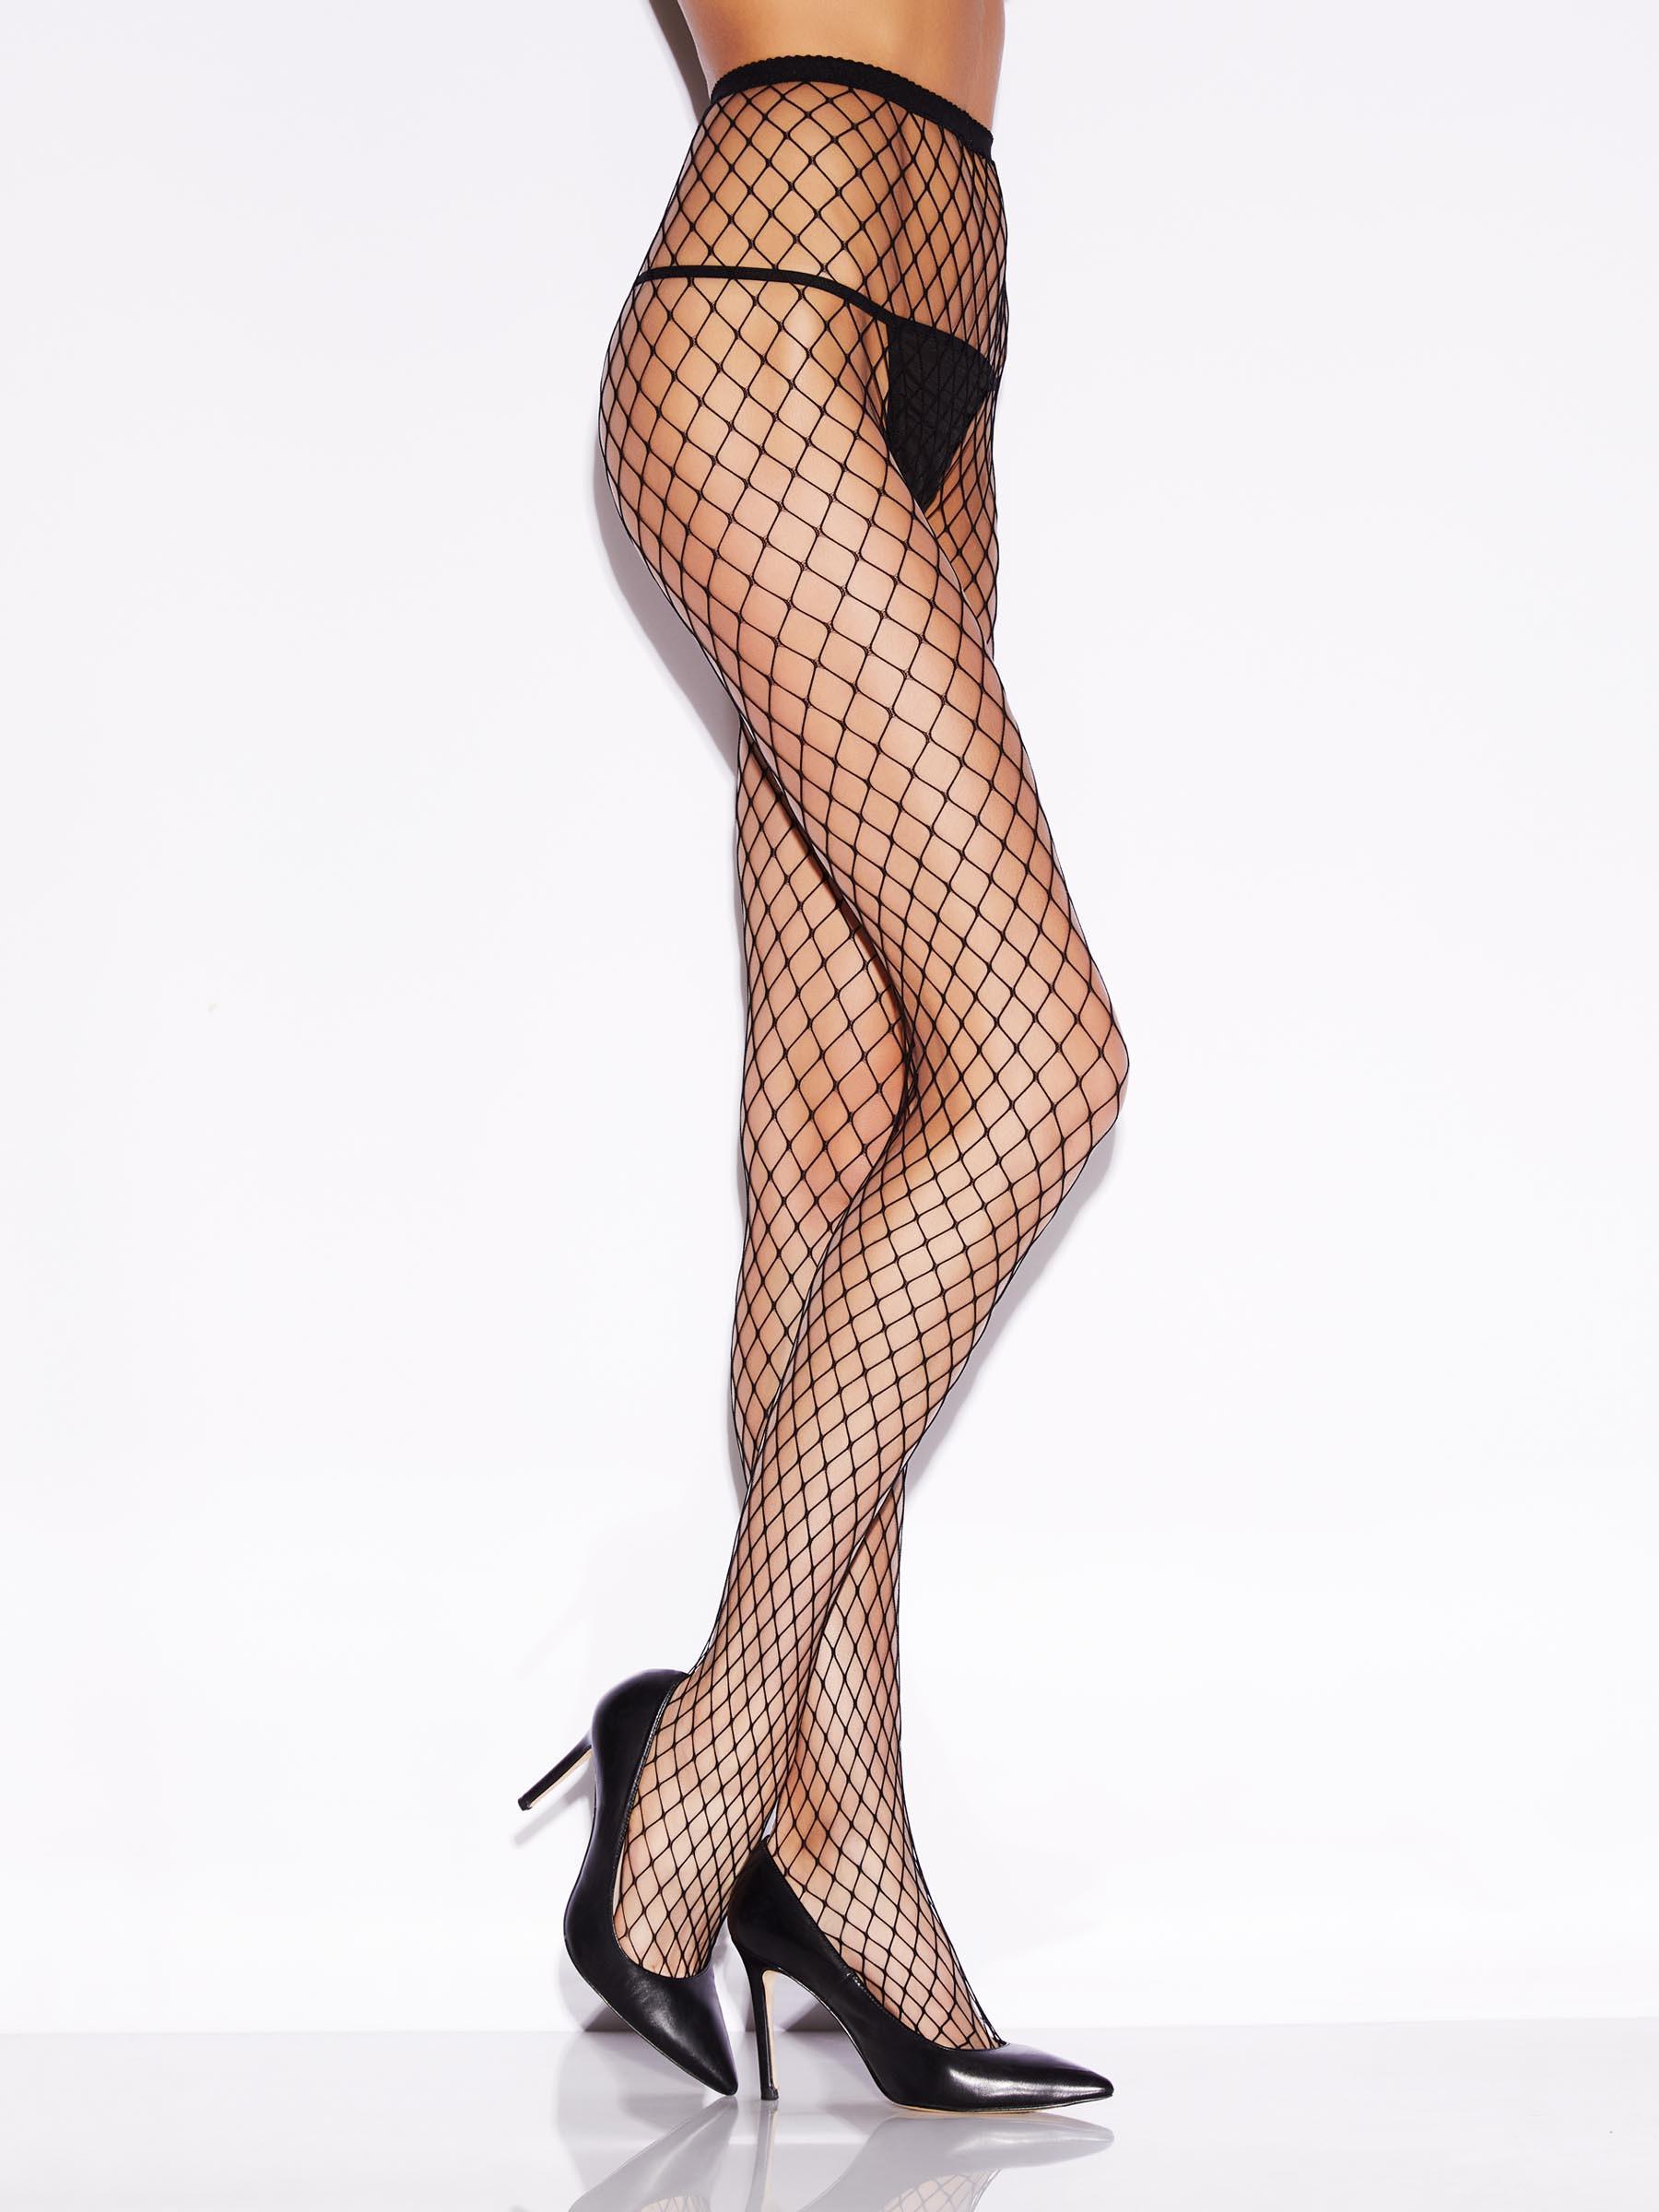 344619da3cc812 Details about Ann Summers Womens Fishnet Tights Semi-Sheer Fishnet Sexy  High Waist Hosiery